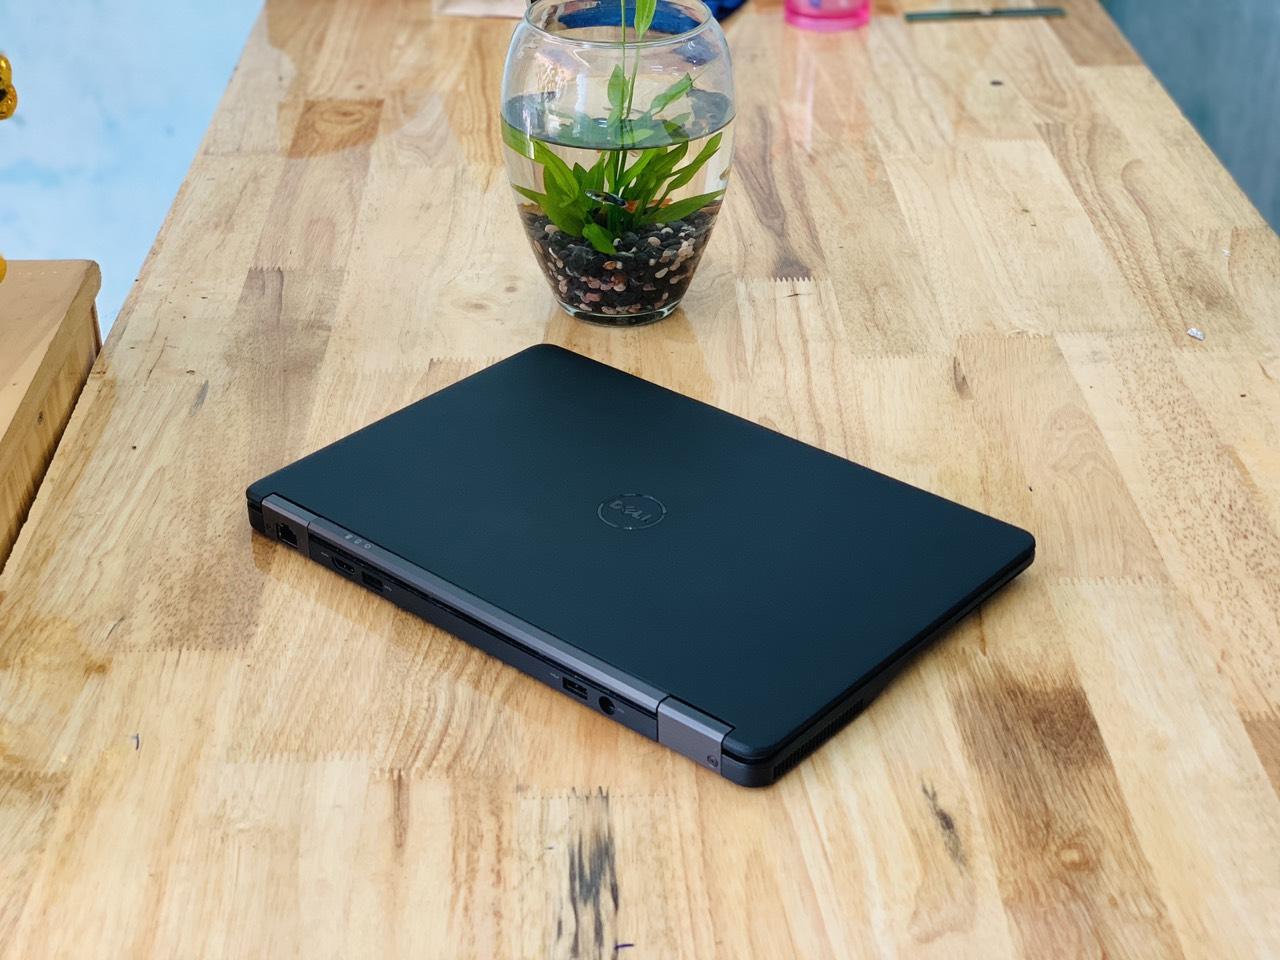 d19bfd641219f647af08 Laptop Dell Latitude E7250 i5 5300U Ram 8GB SSD 256GB 12.5 inch Siêu Bền Siêu Mỏng